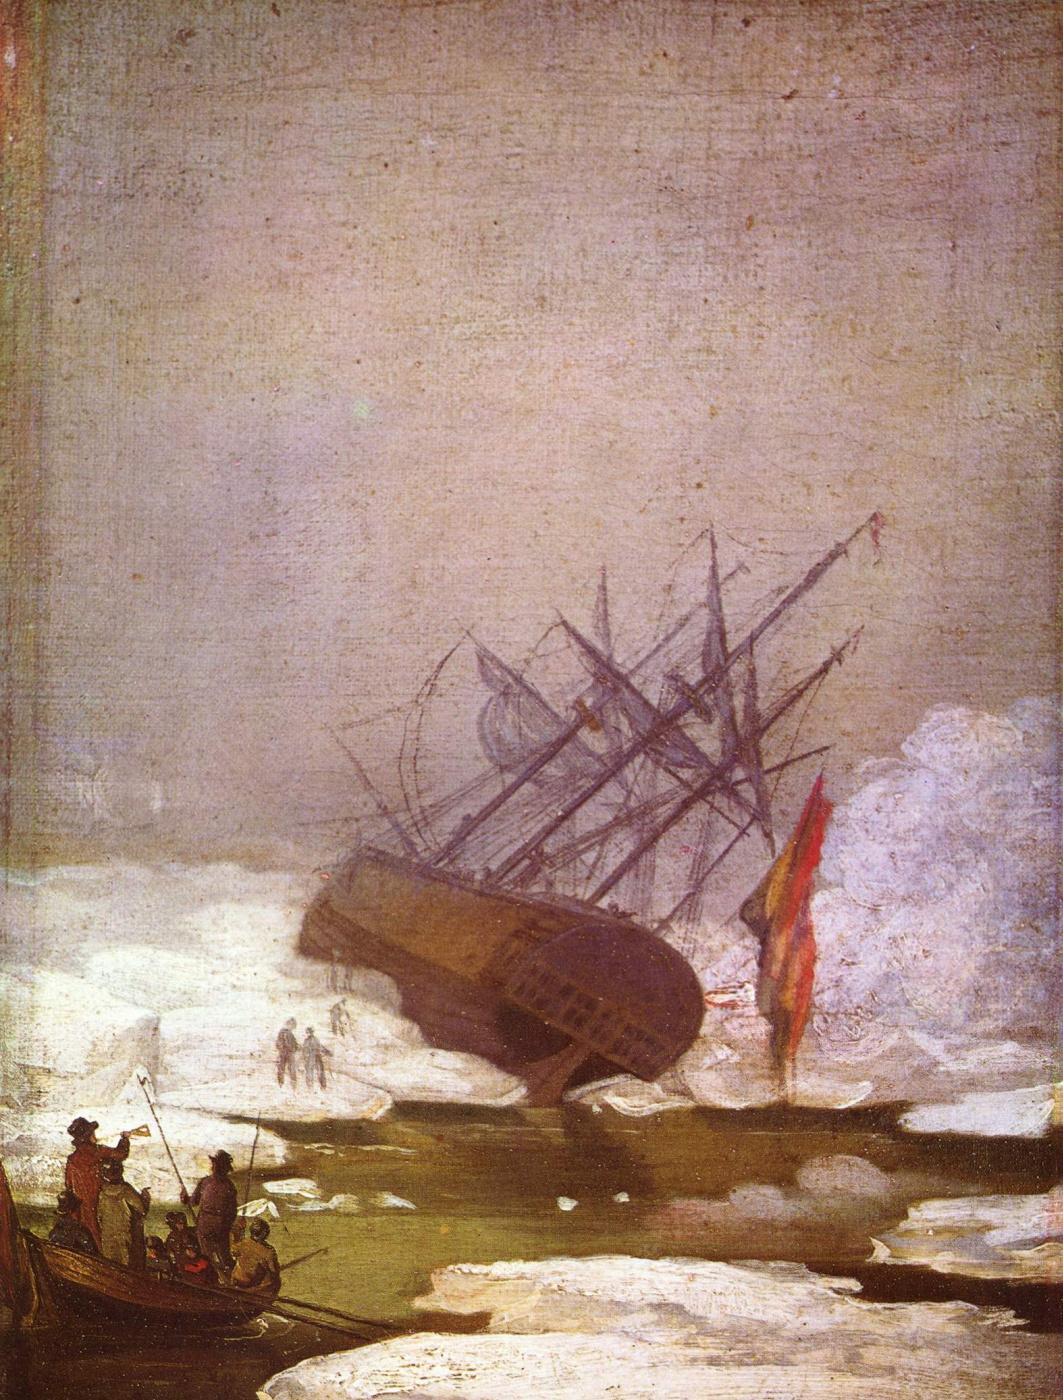 Caspar David Friedrich. Shipwreck in the polar sea